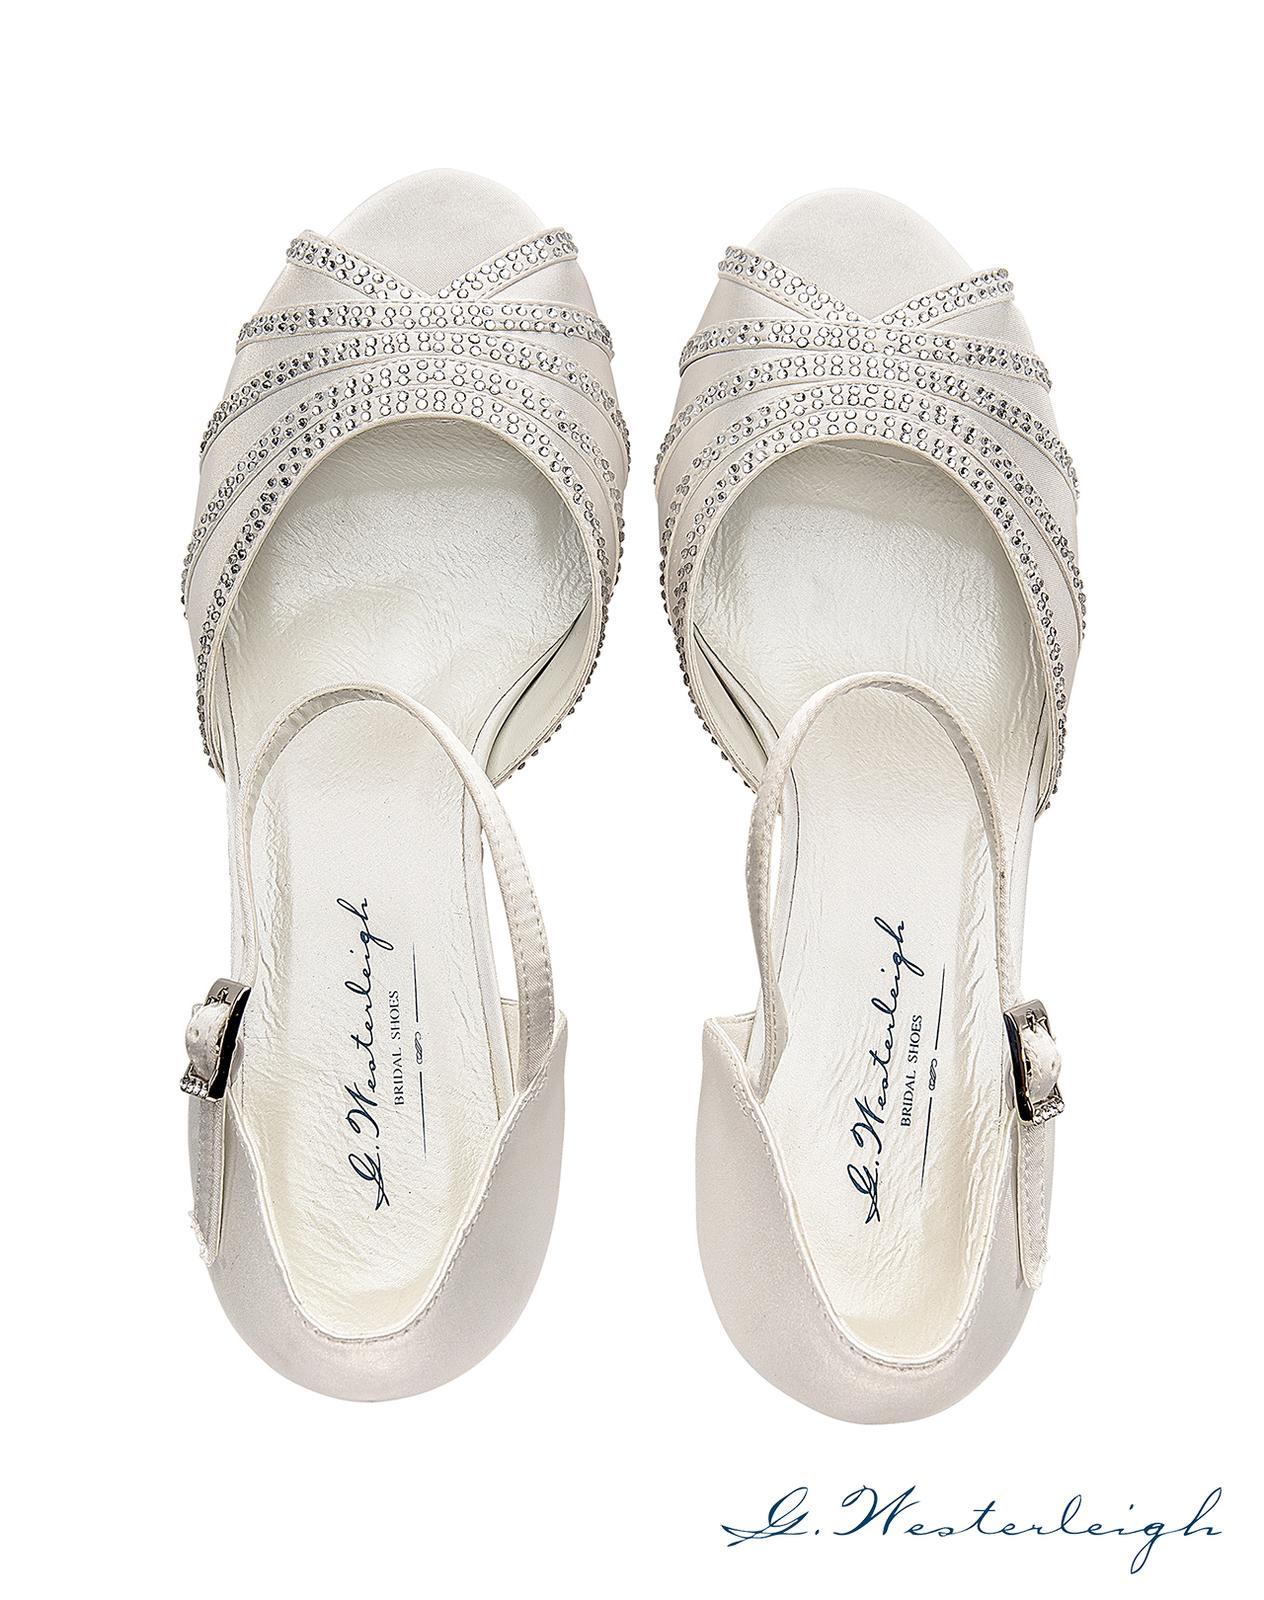 Svadobné topánky Jessica - Obrázok č. 3